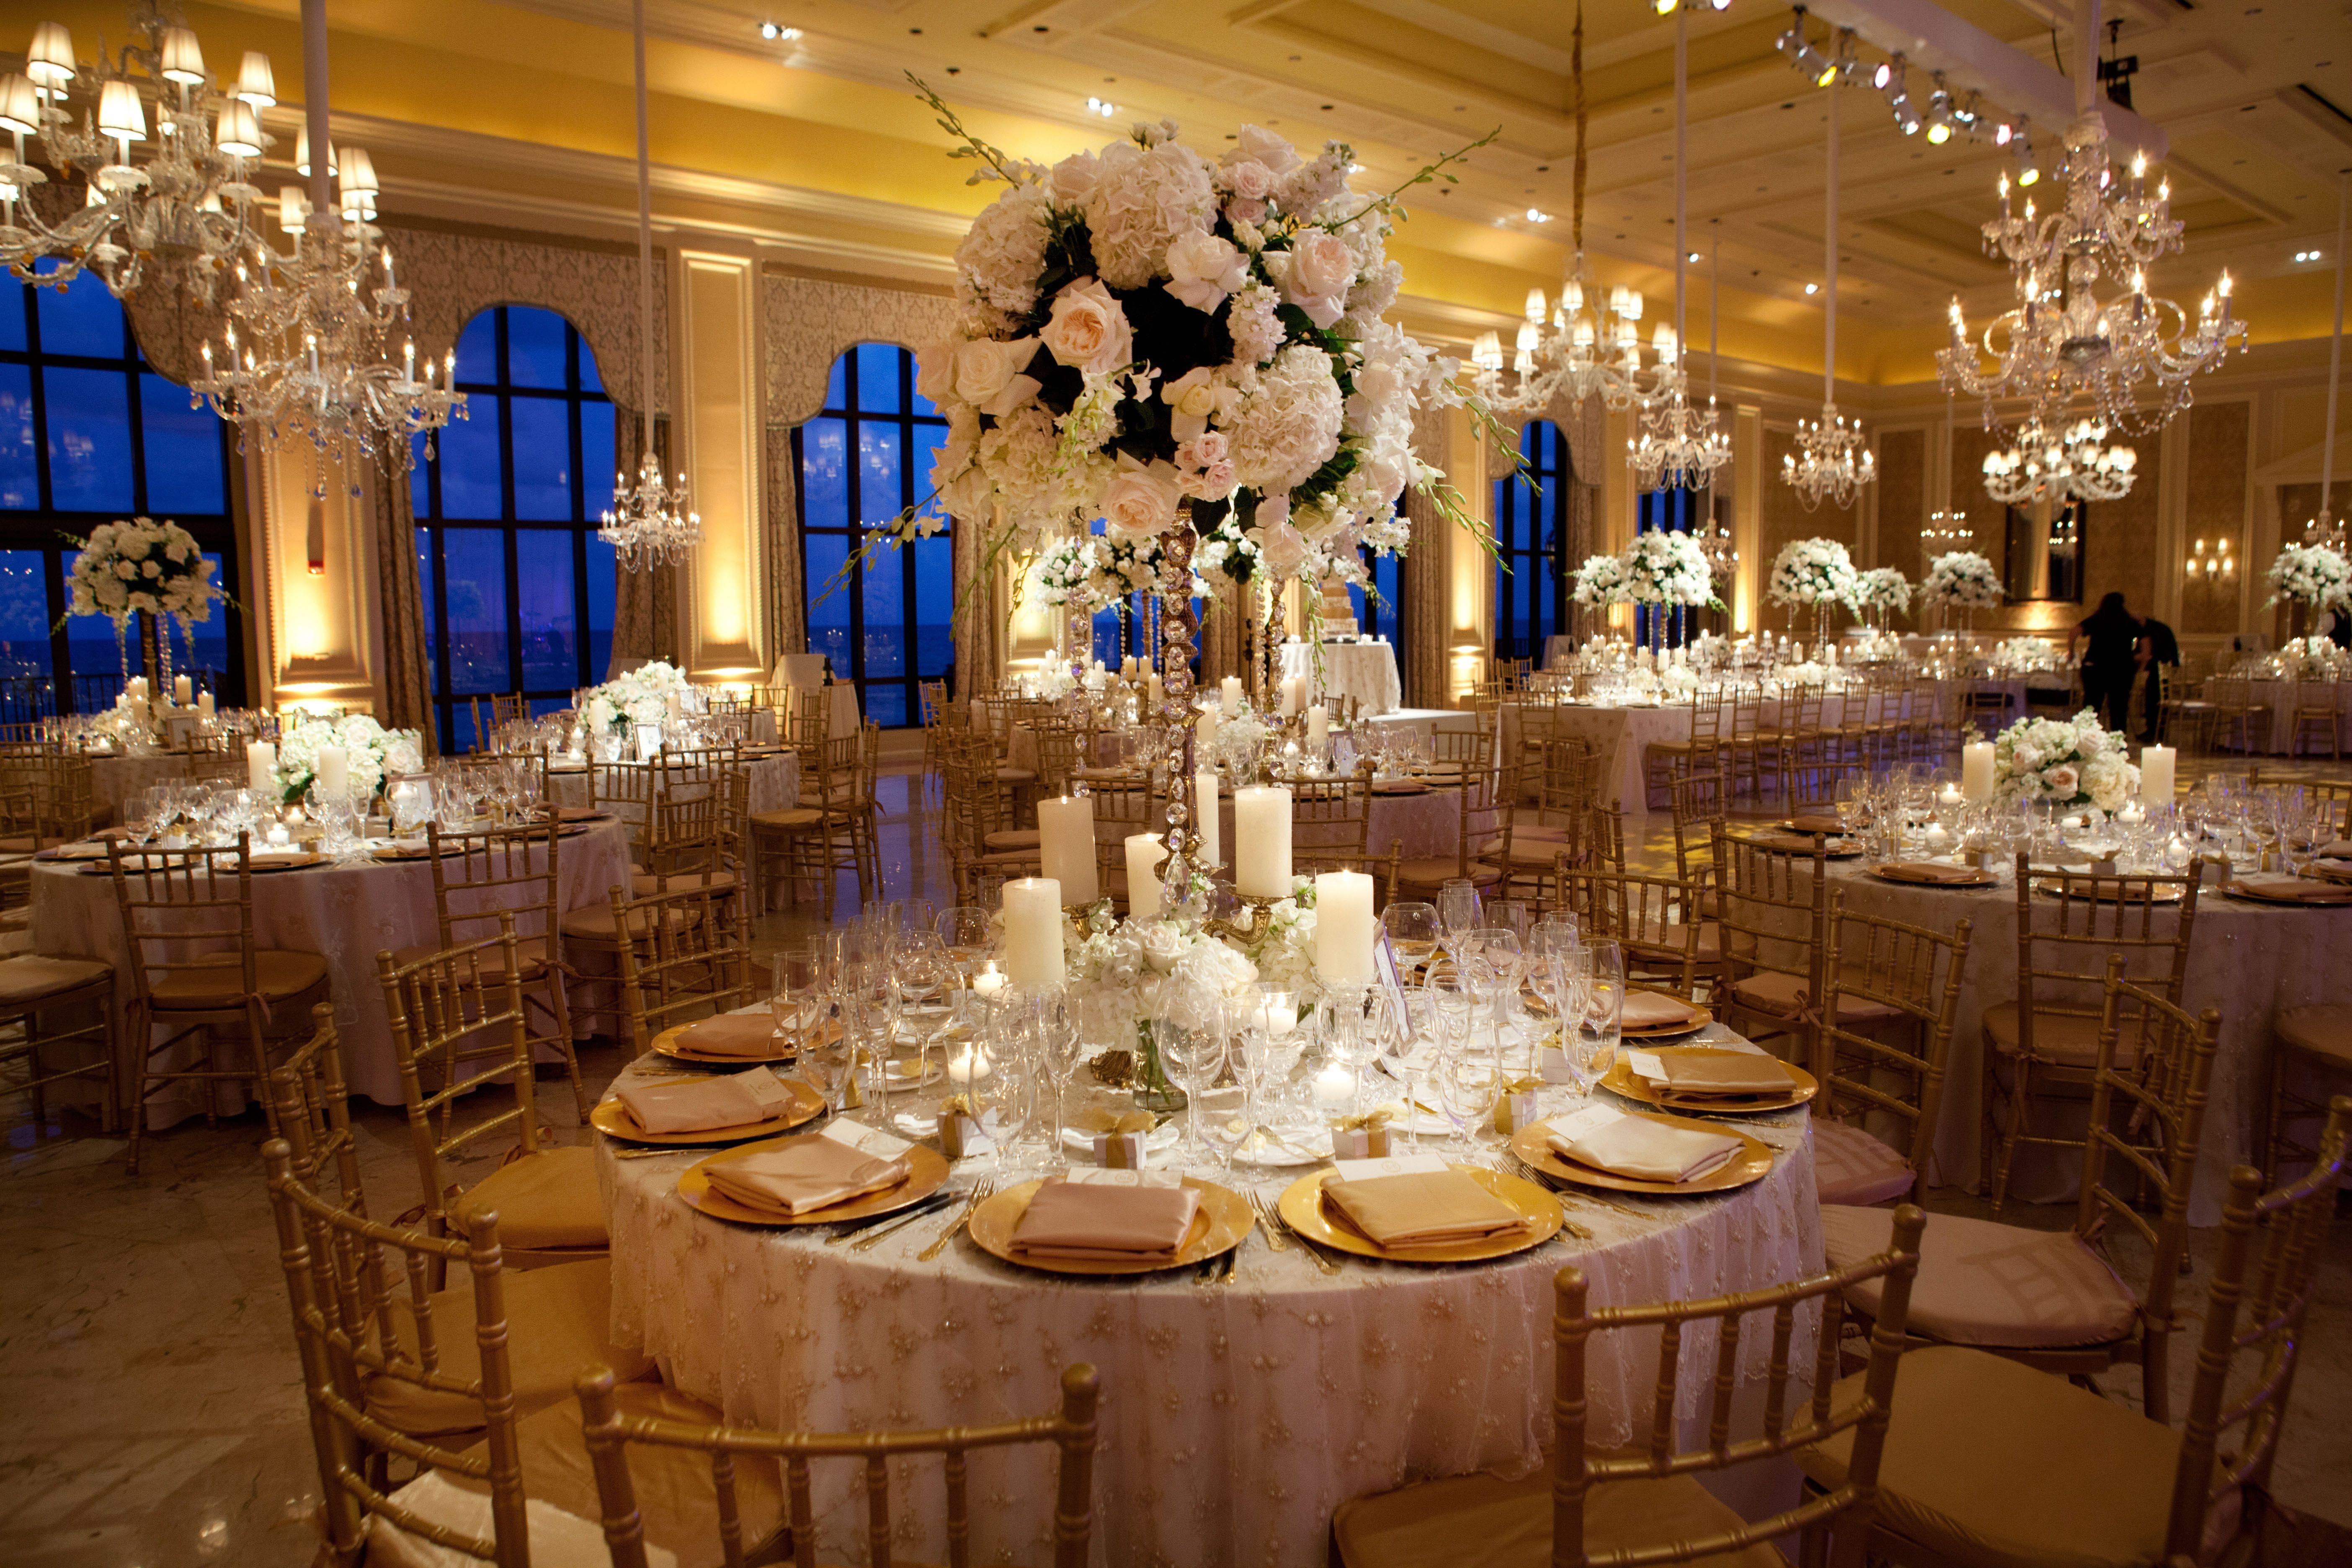 Sofia Vergara And Joe Manganiello's Wedding At The